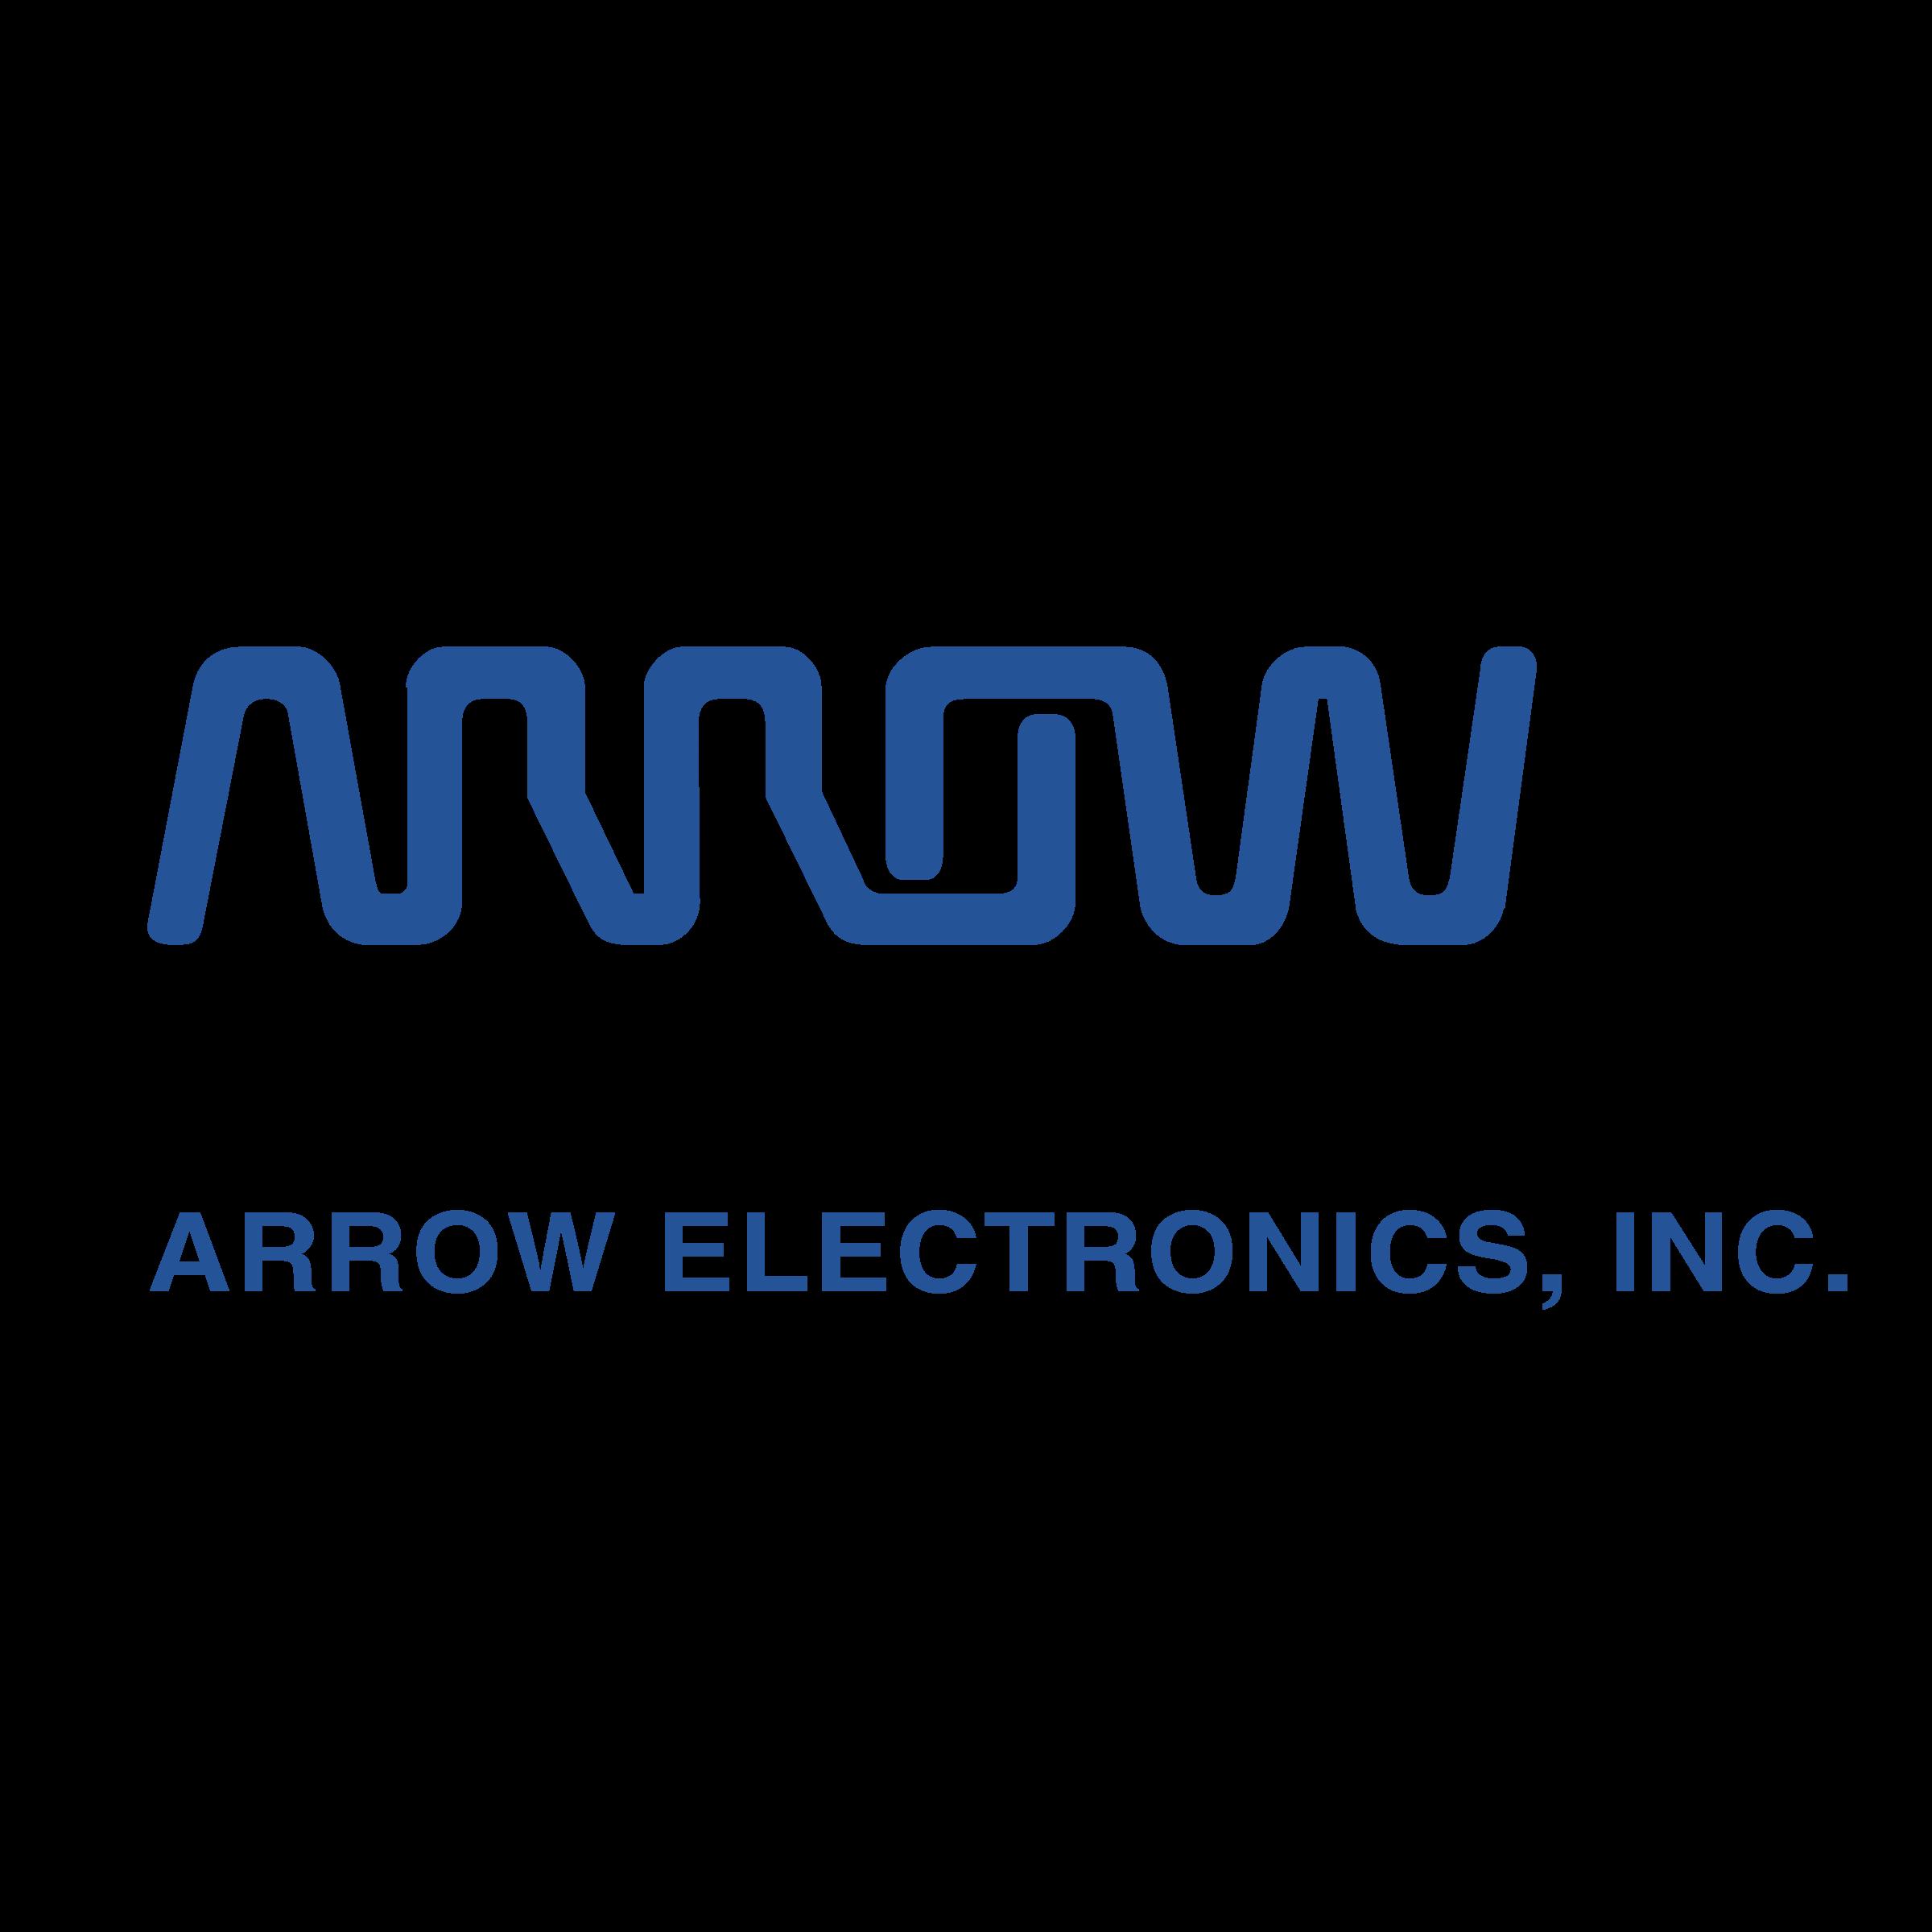 Arrow Electronics 01 Logo Png Transparent Svg Vector Freebie Supply